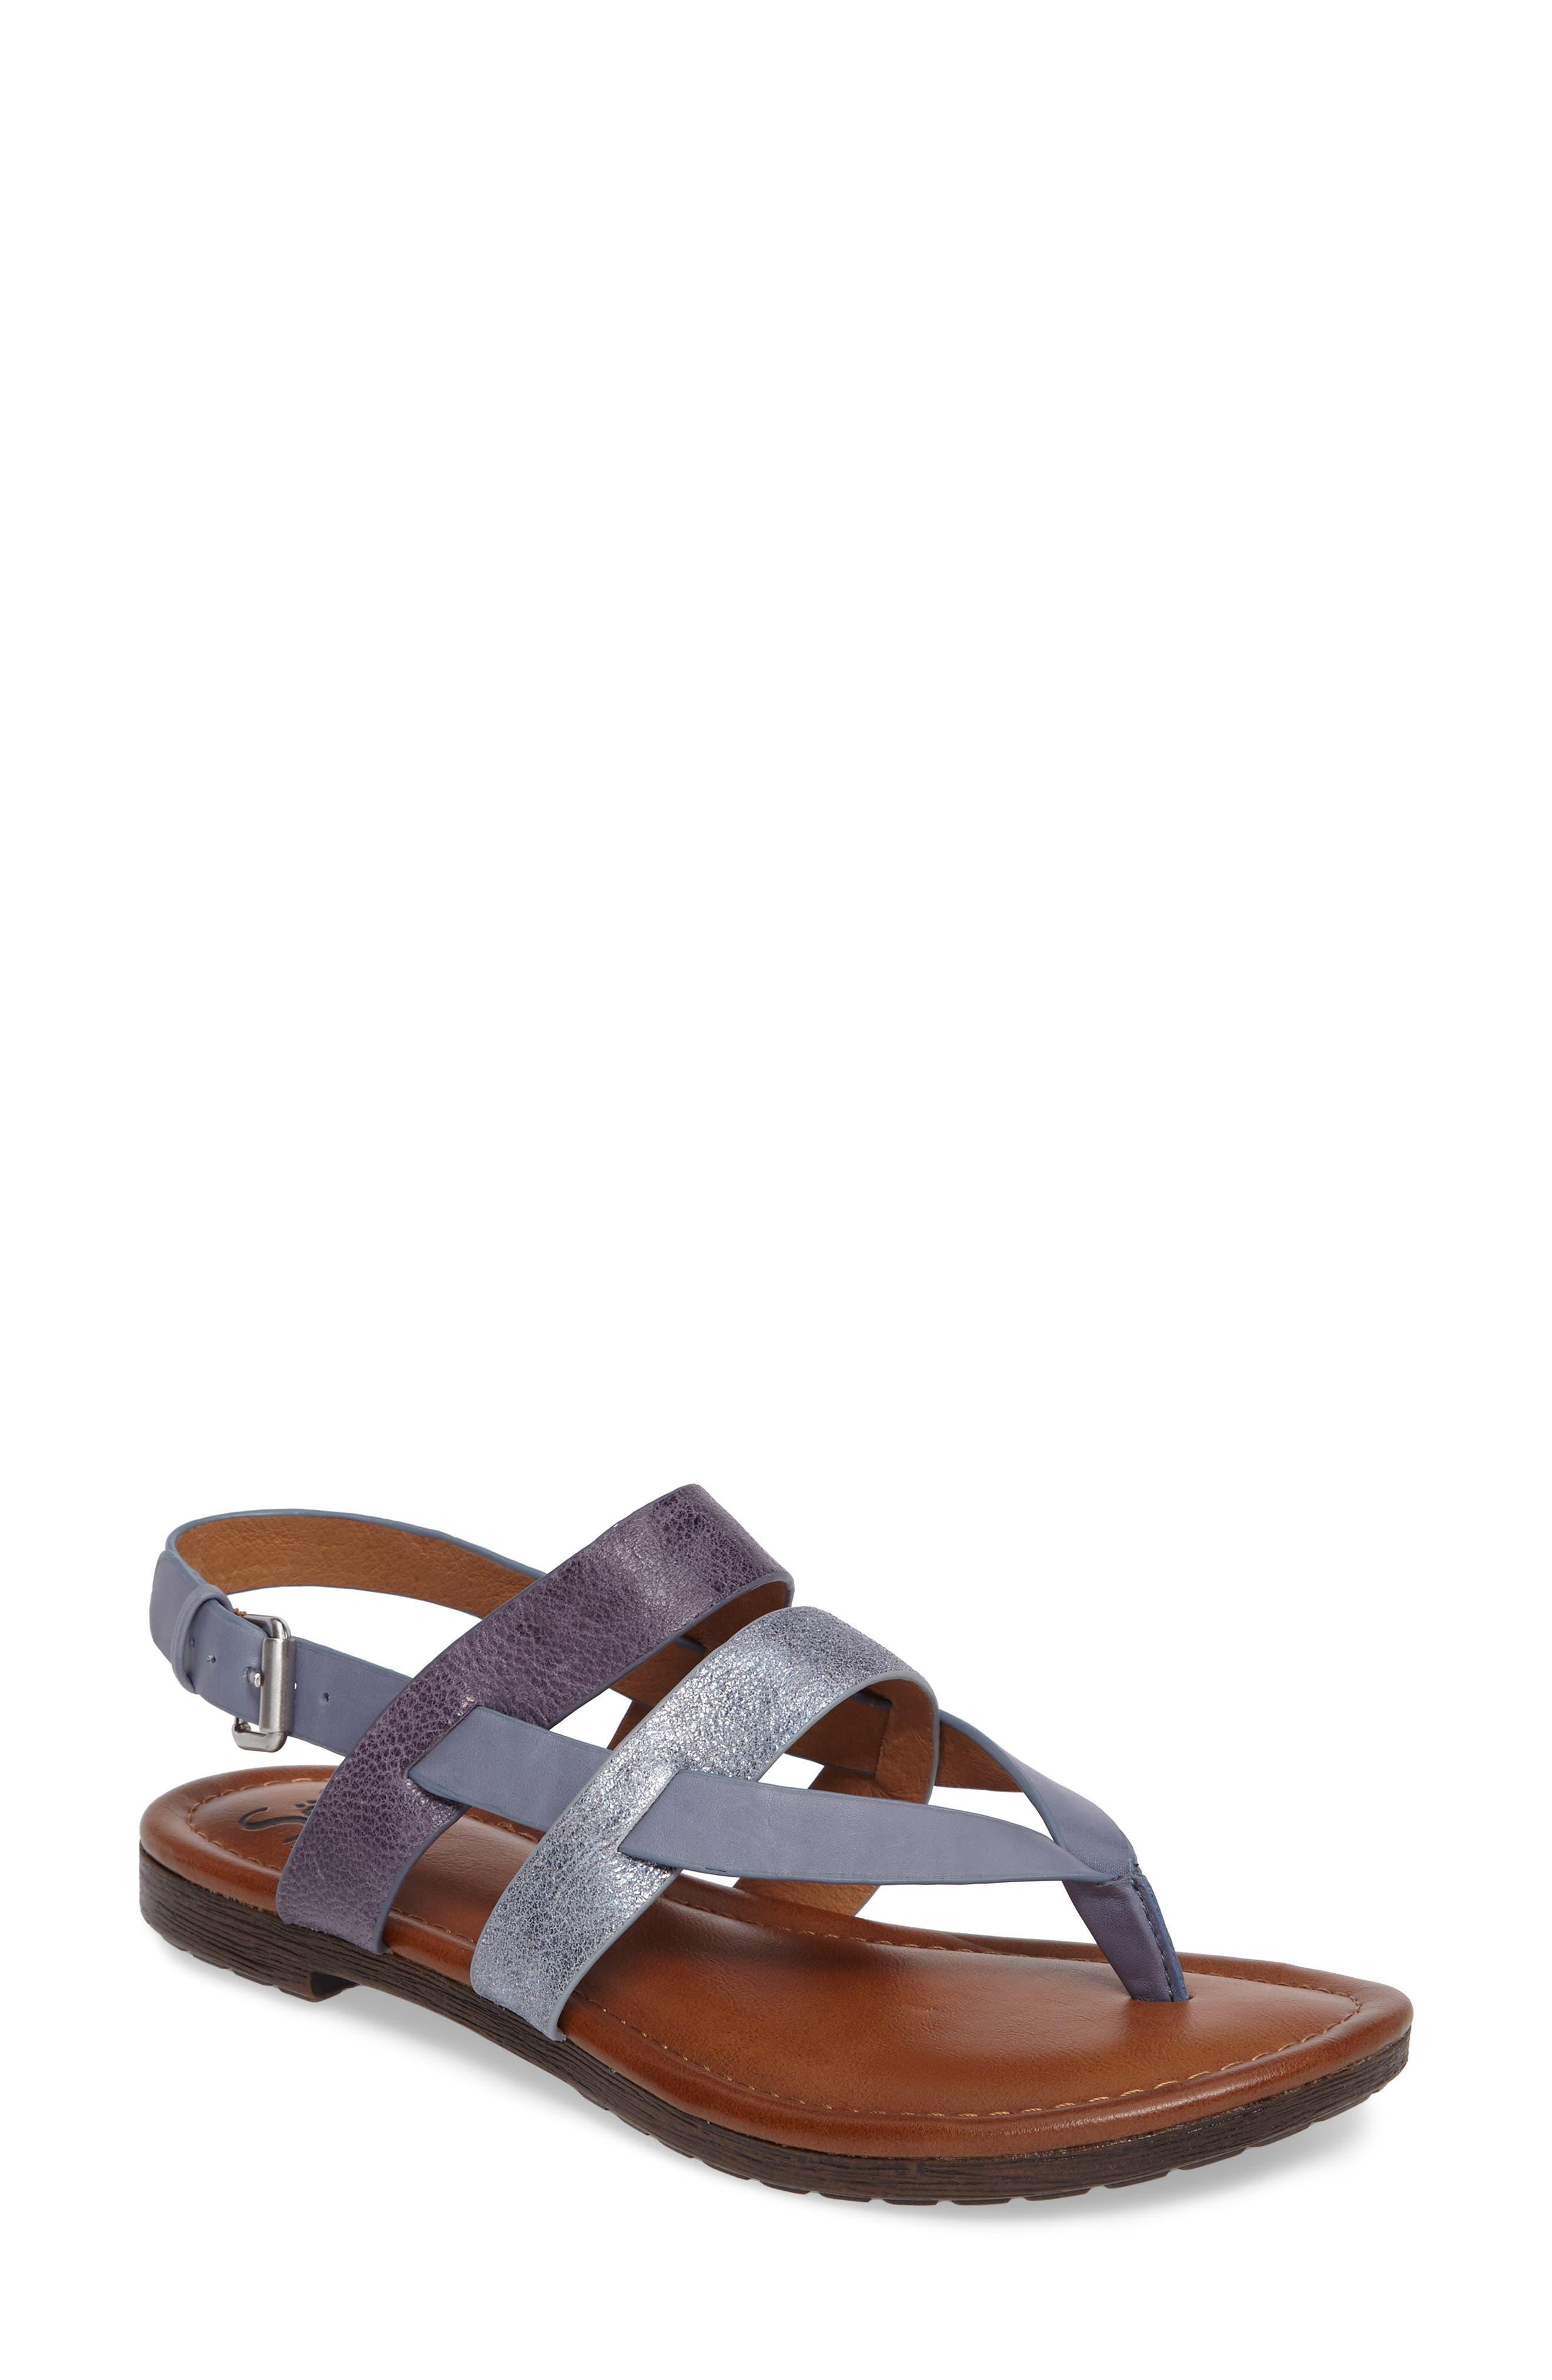 Bena Strappy Sandal,                             Main thumbnail 1, color,                             Denim/ Blue/ Pale Blue Leather